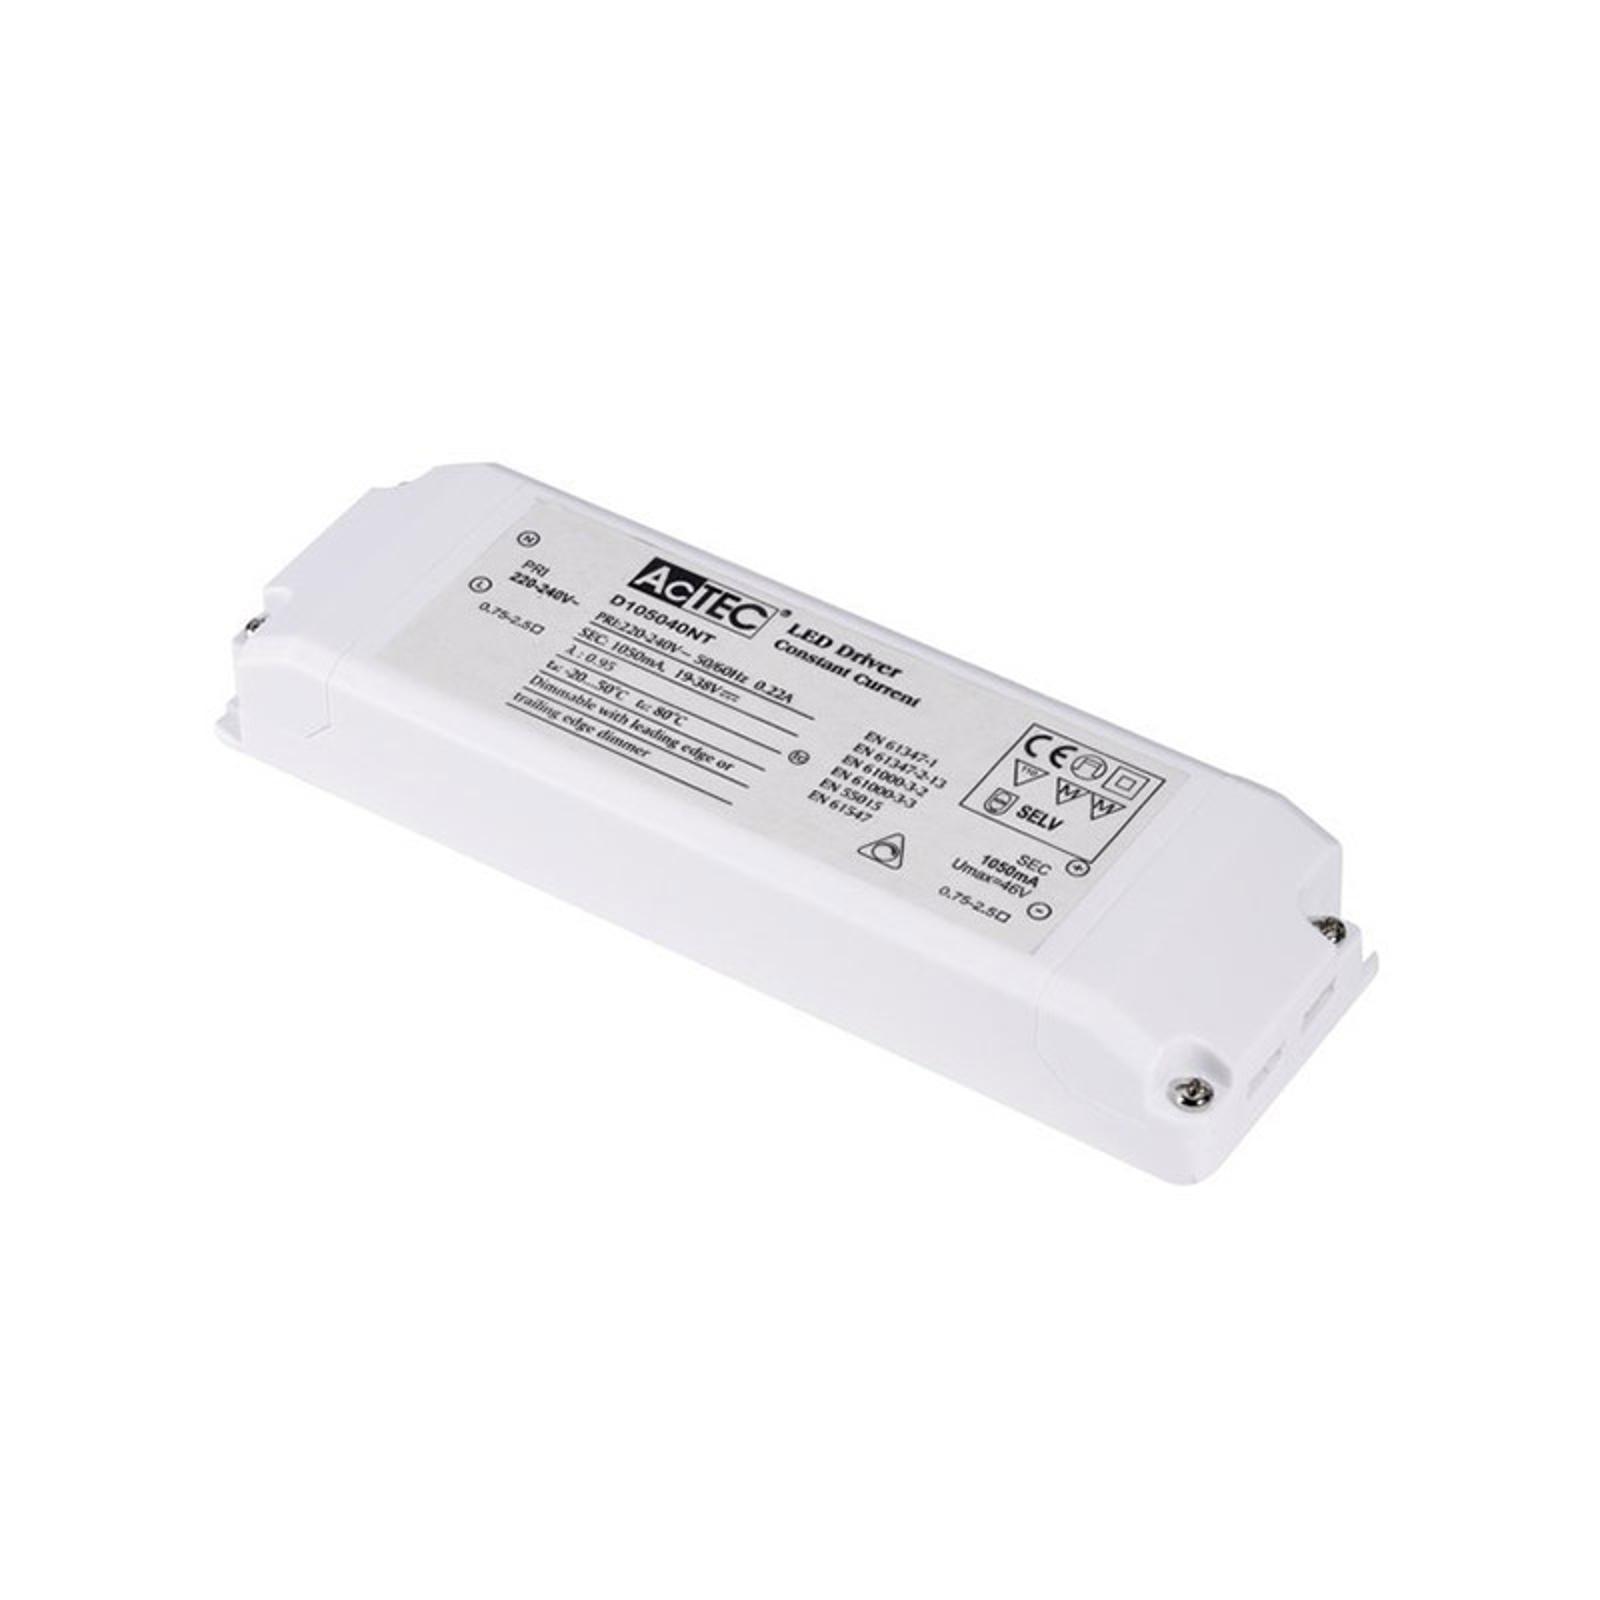 SLV LED-Treiber 1050 mA, 20-40 W, Triac